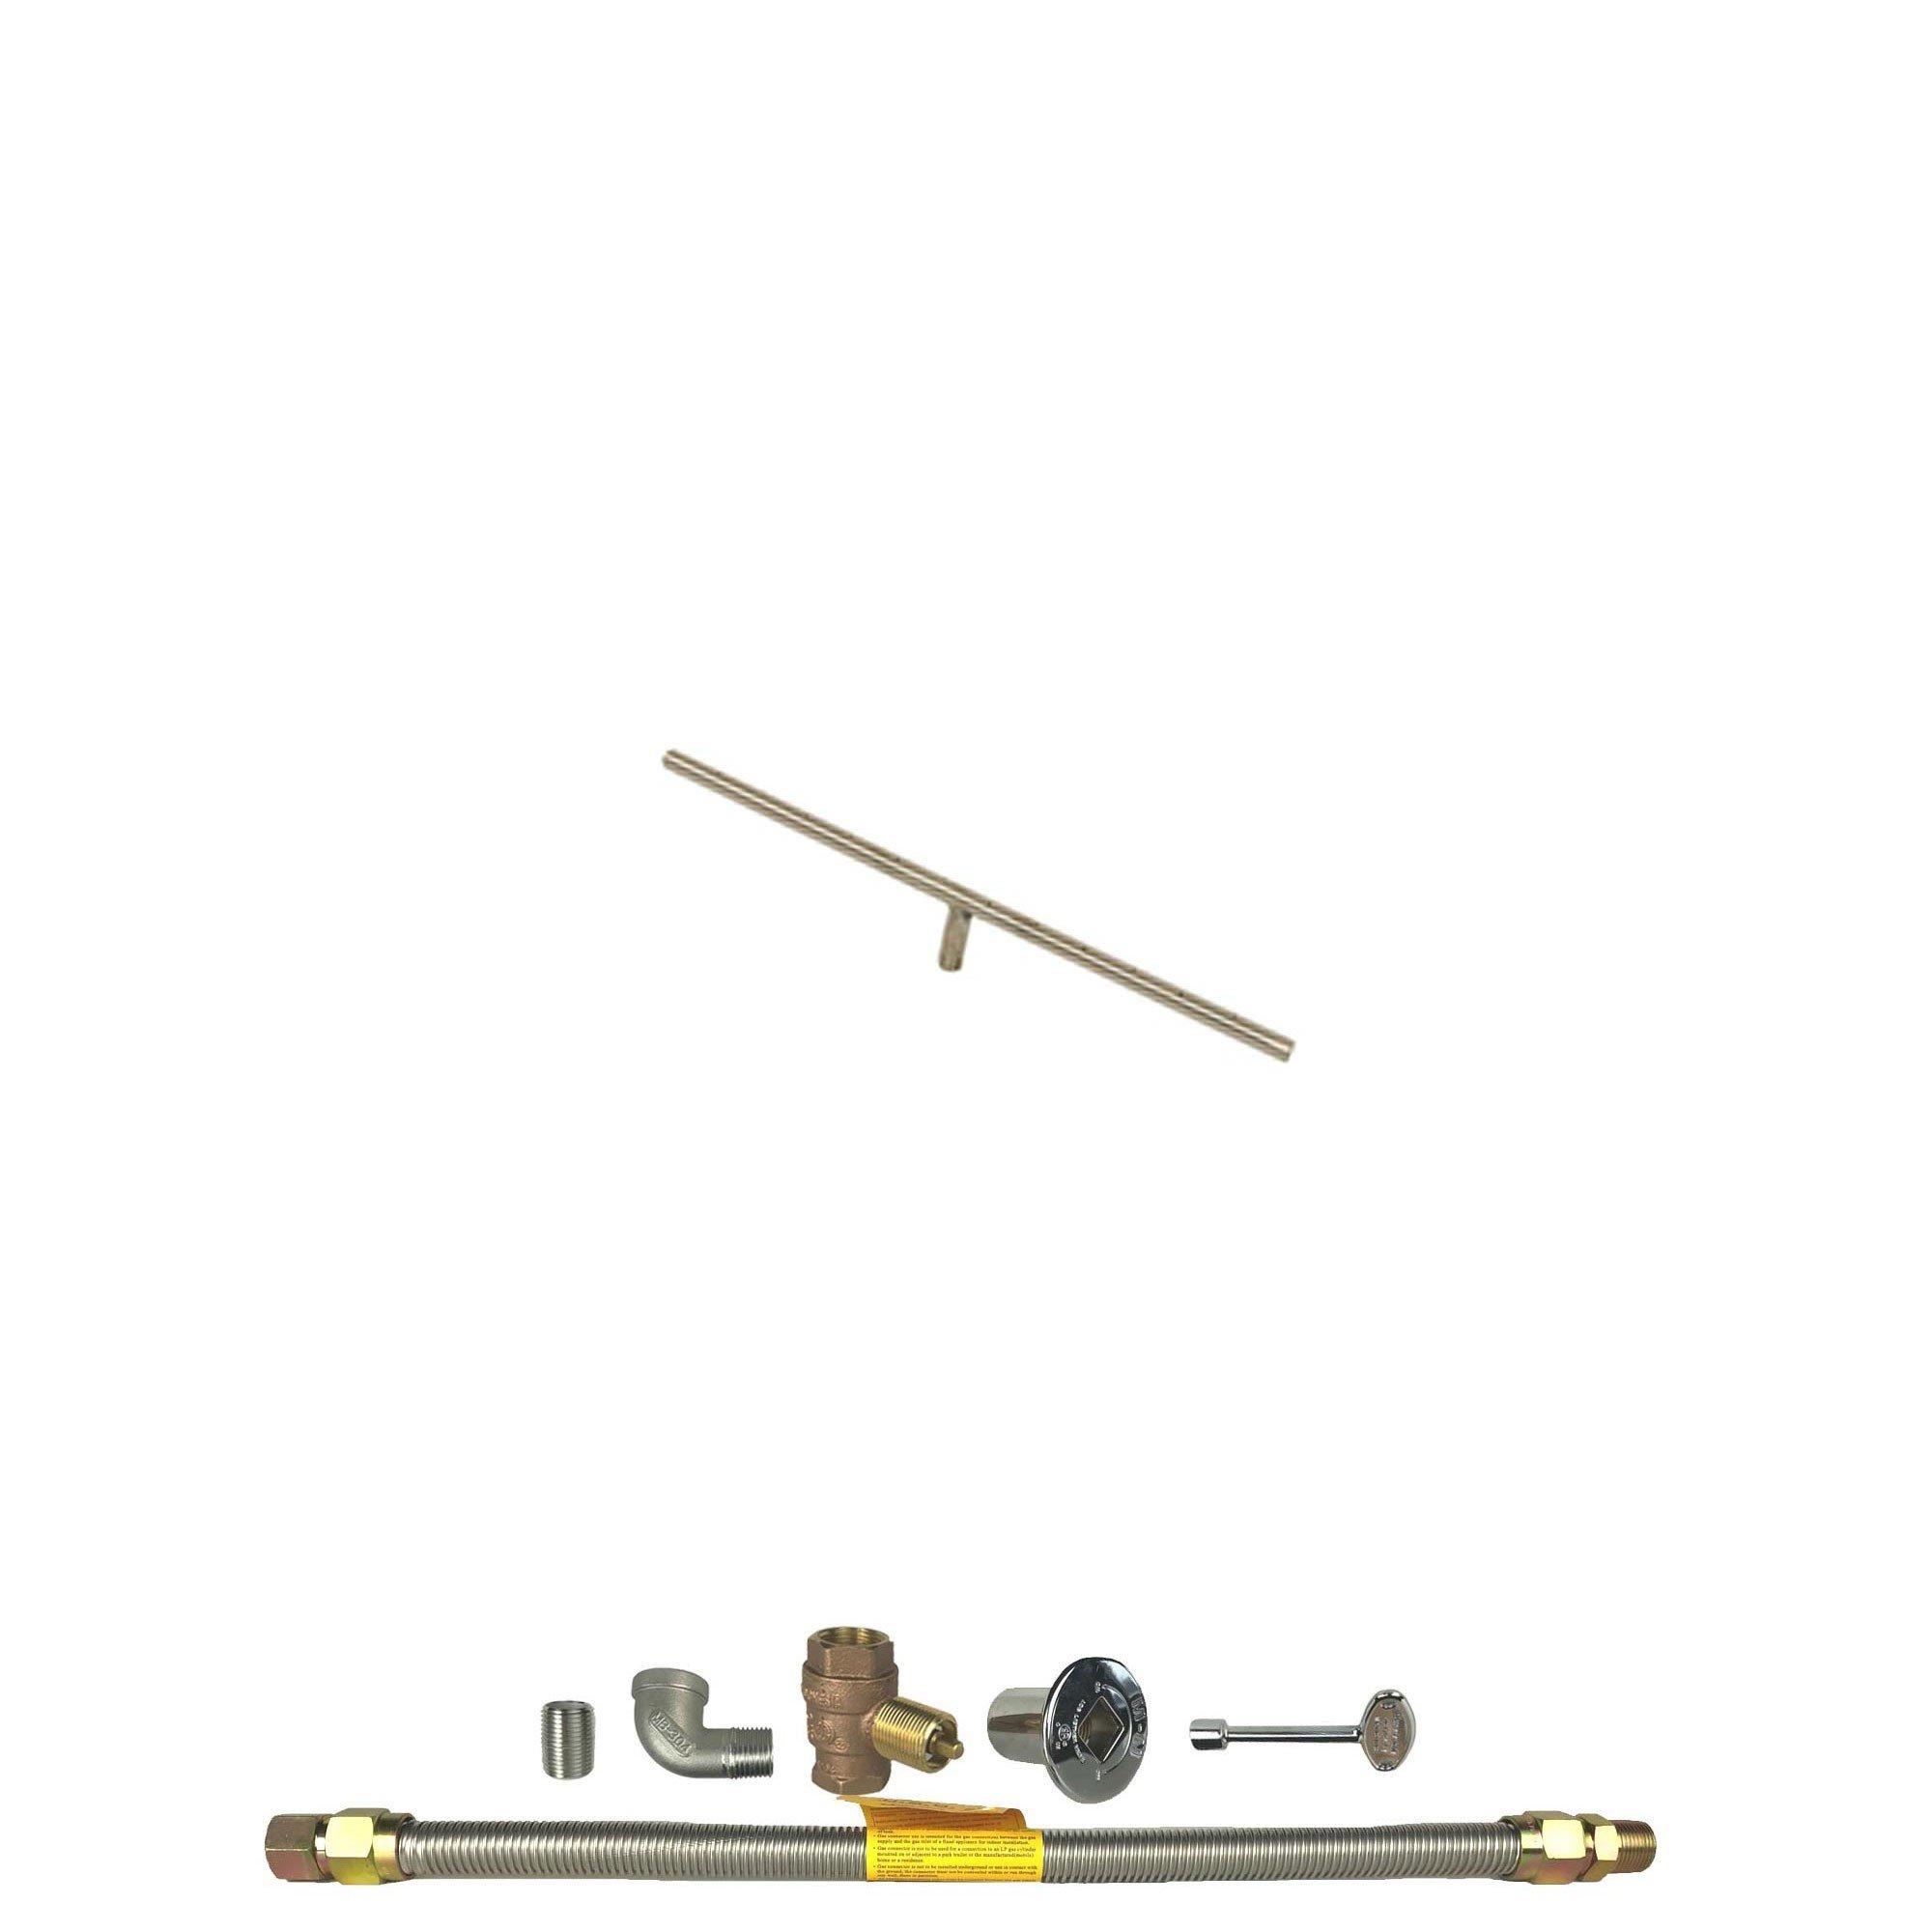 Spotix HPC Linear T-Burner Fire Pit Burner Kit (FPS-TBSS24KIT-NG-MSCB), 24-Inch Burner, Match Light, Natural Gas by Spotix